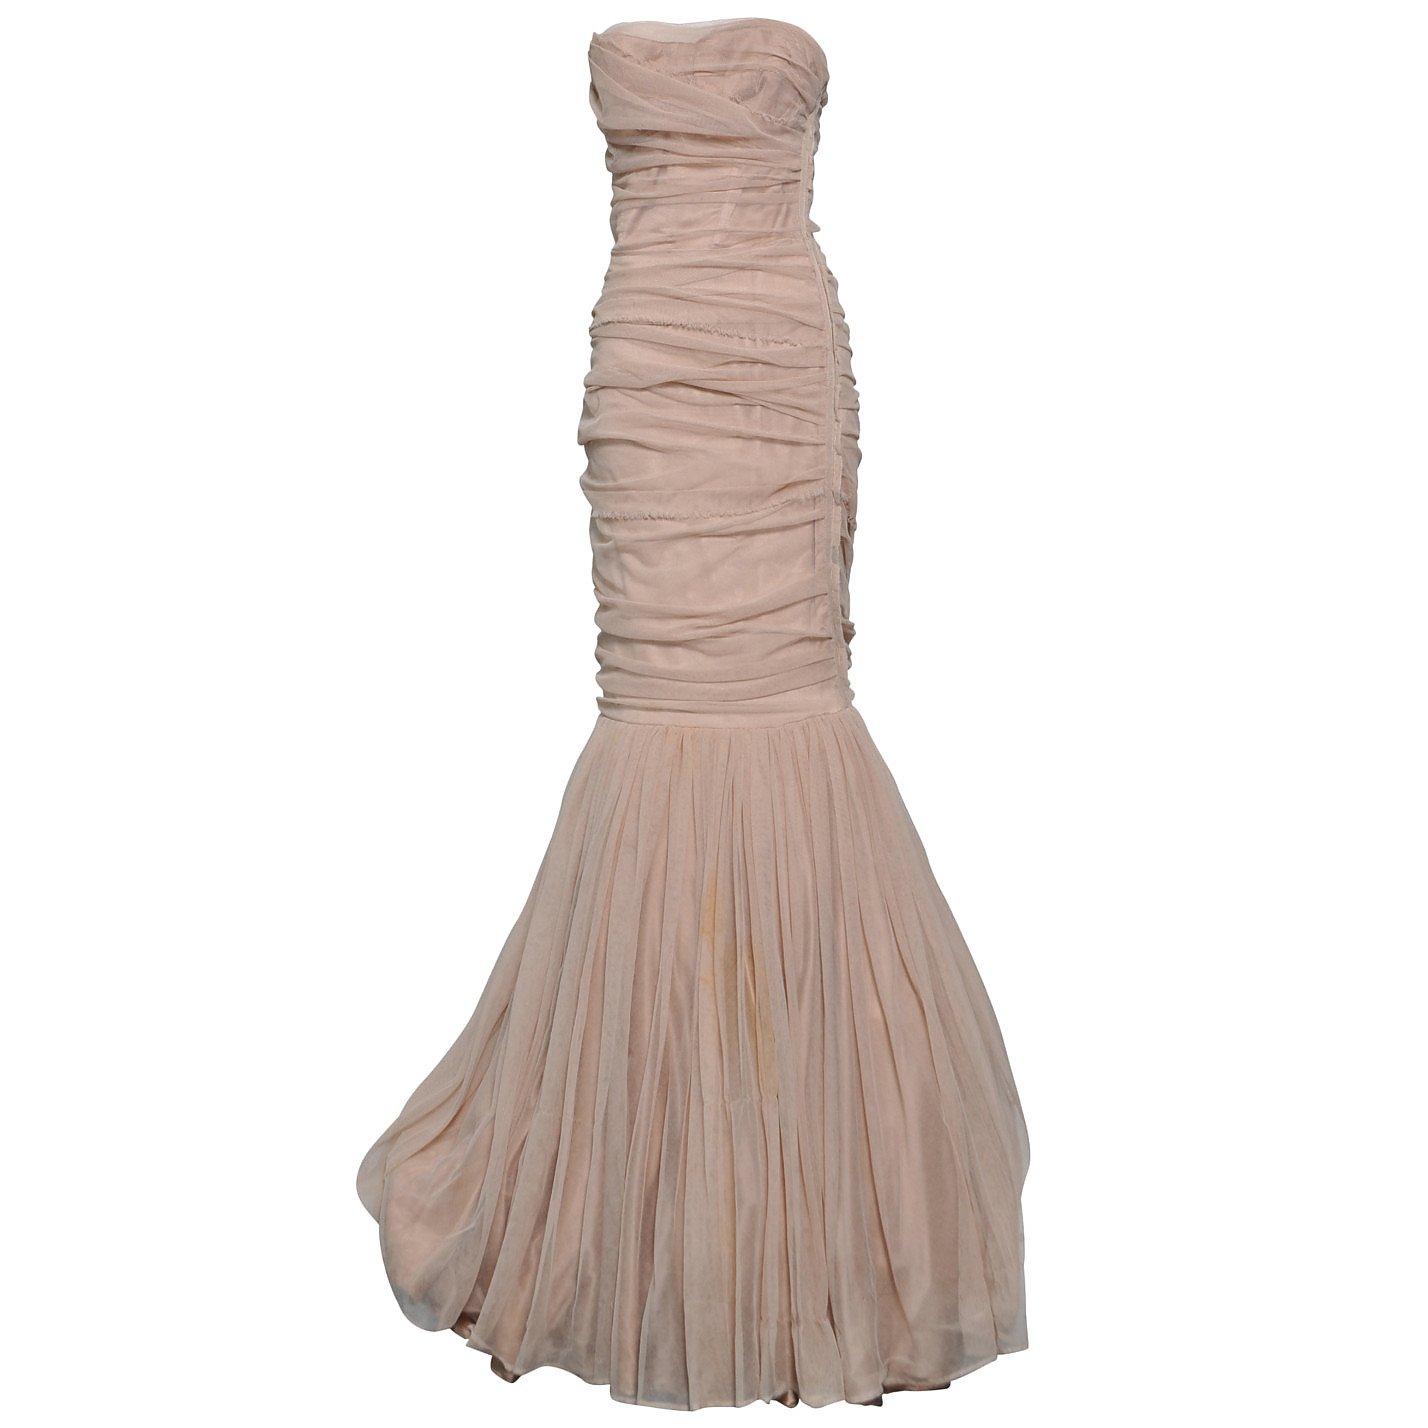 DOLCE & GABBANA Bandage Mermaid Dress